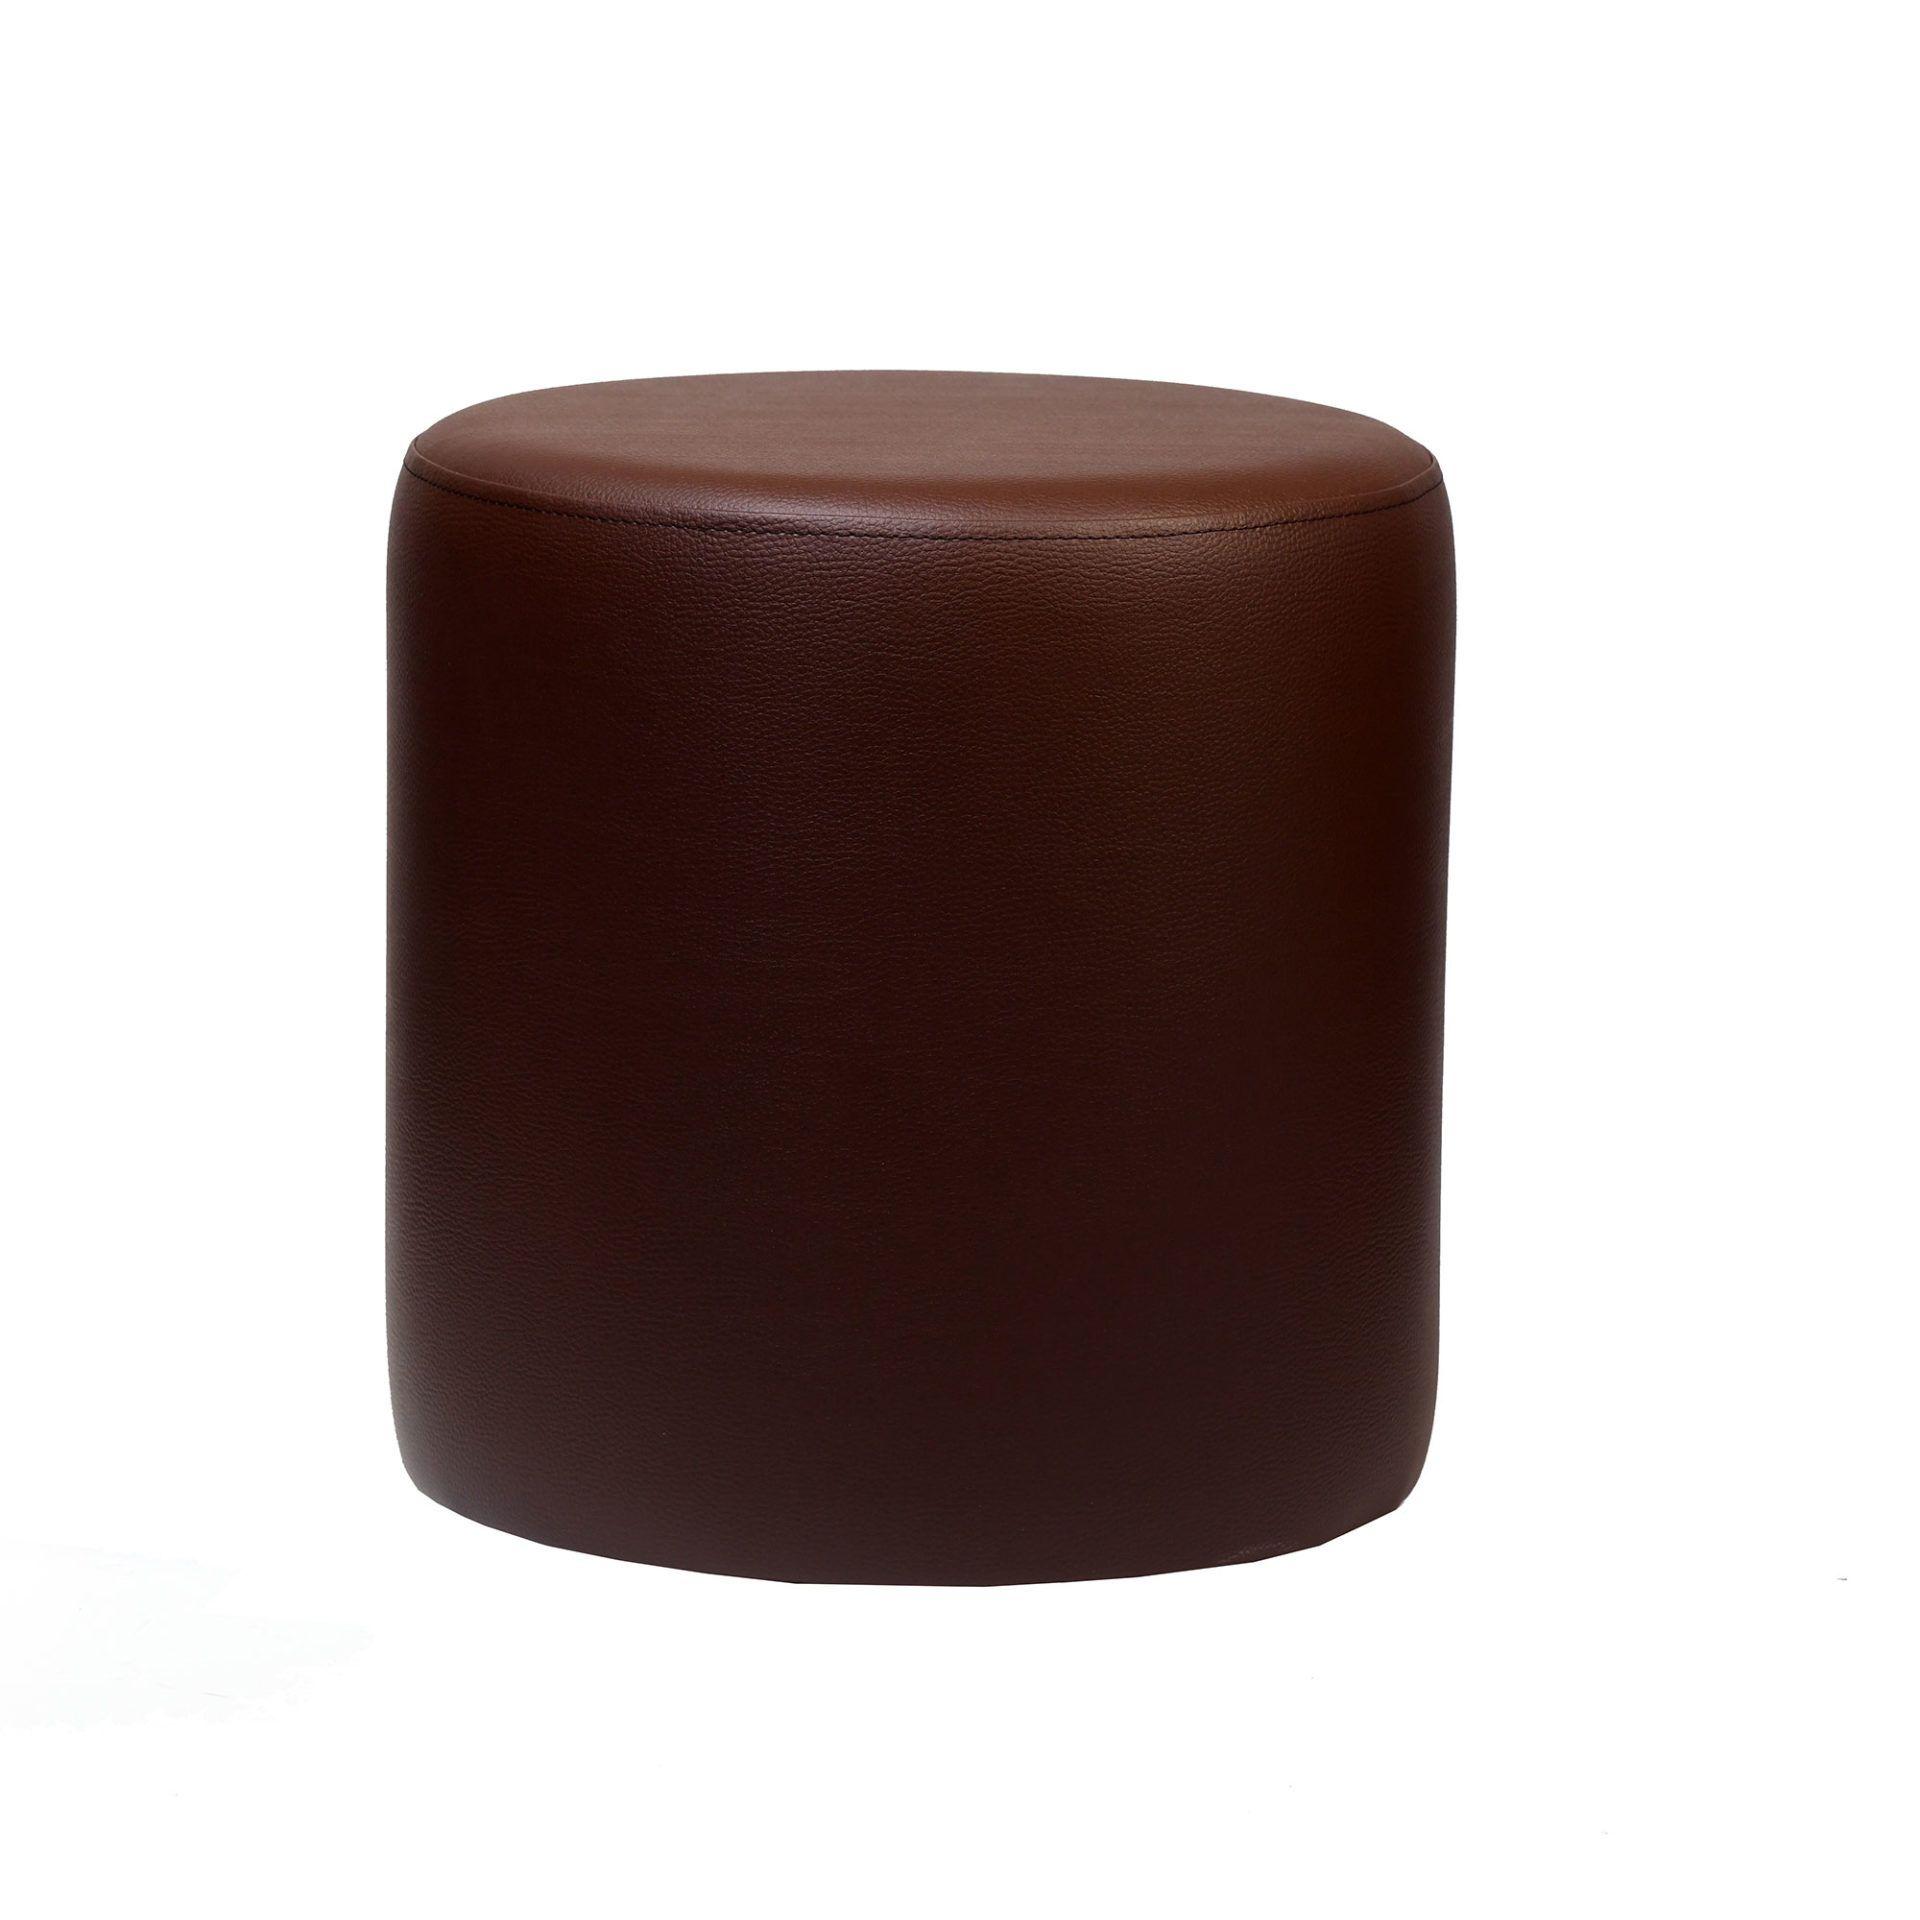 roundottoman chocolate